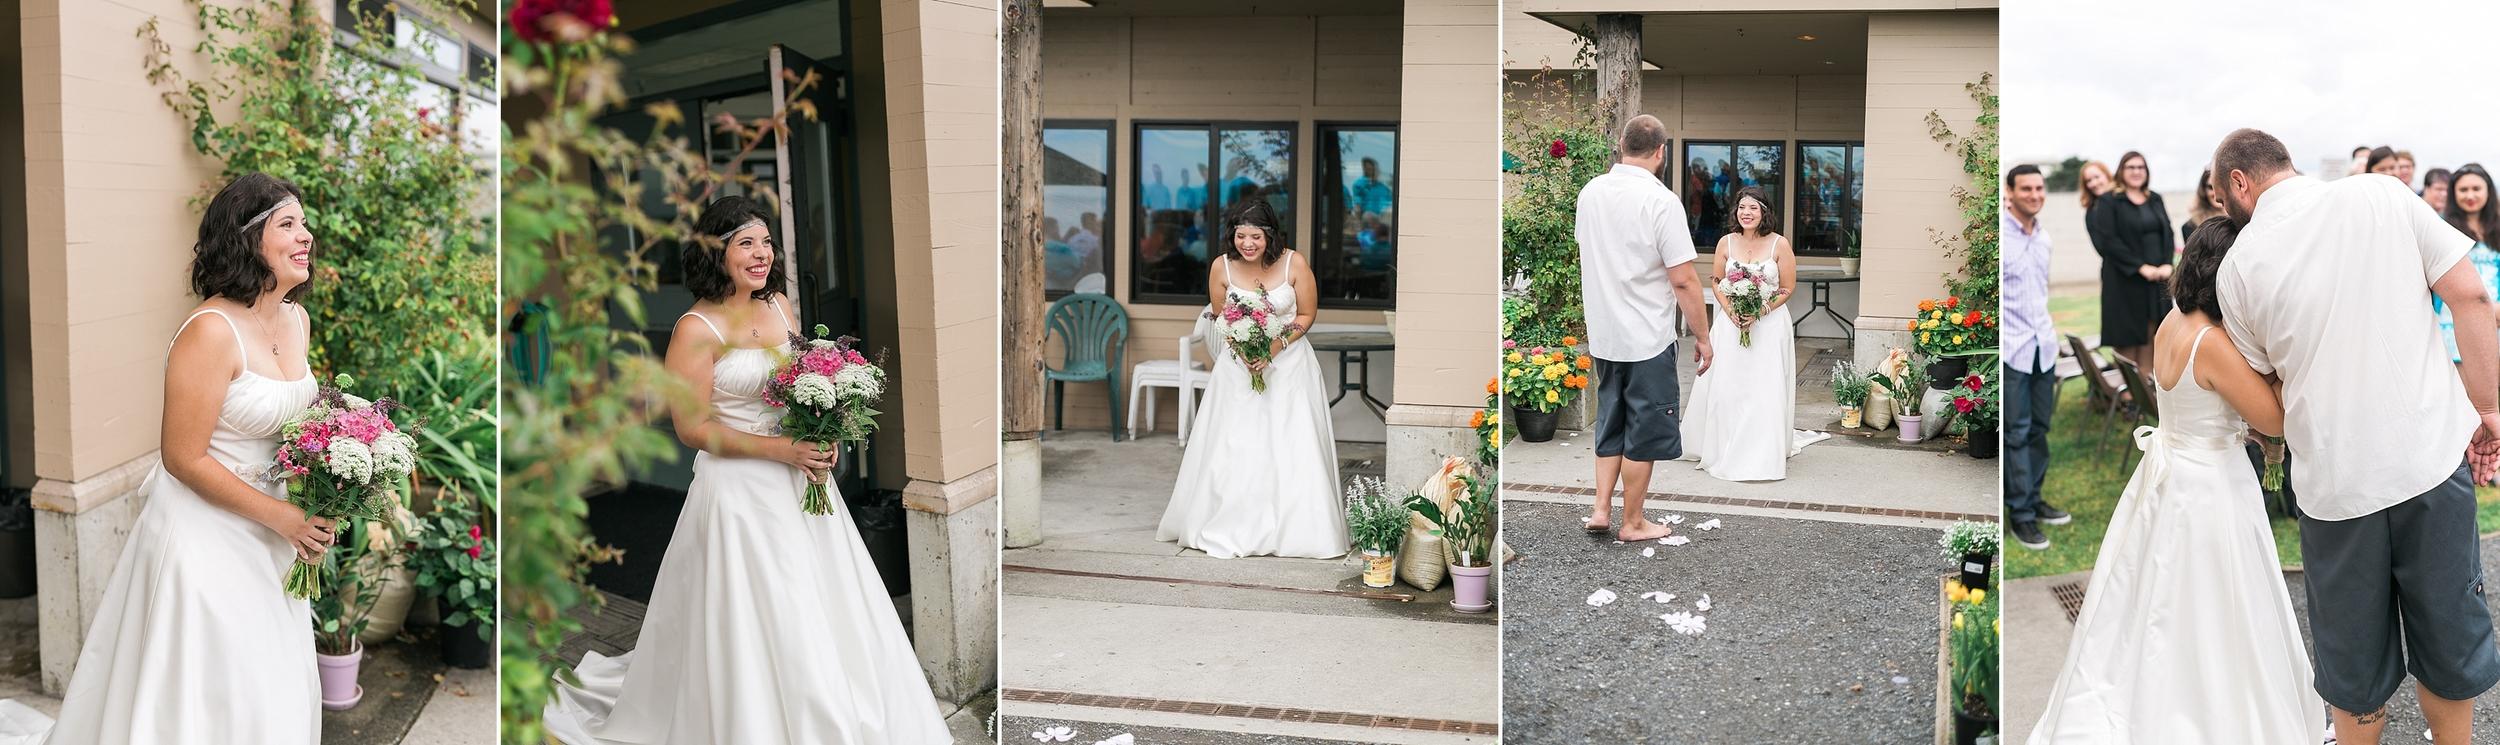 ashley vos photography seattle area wedding photographer_0623.jpg